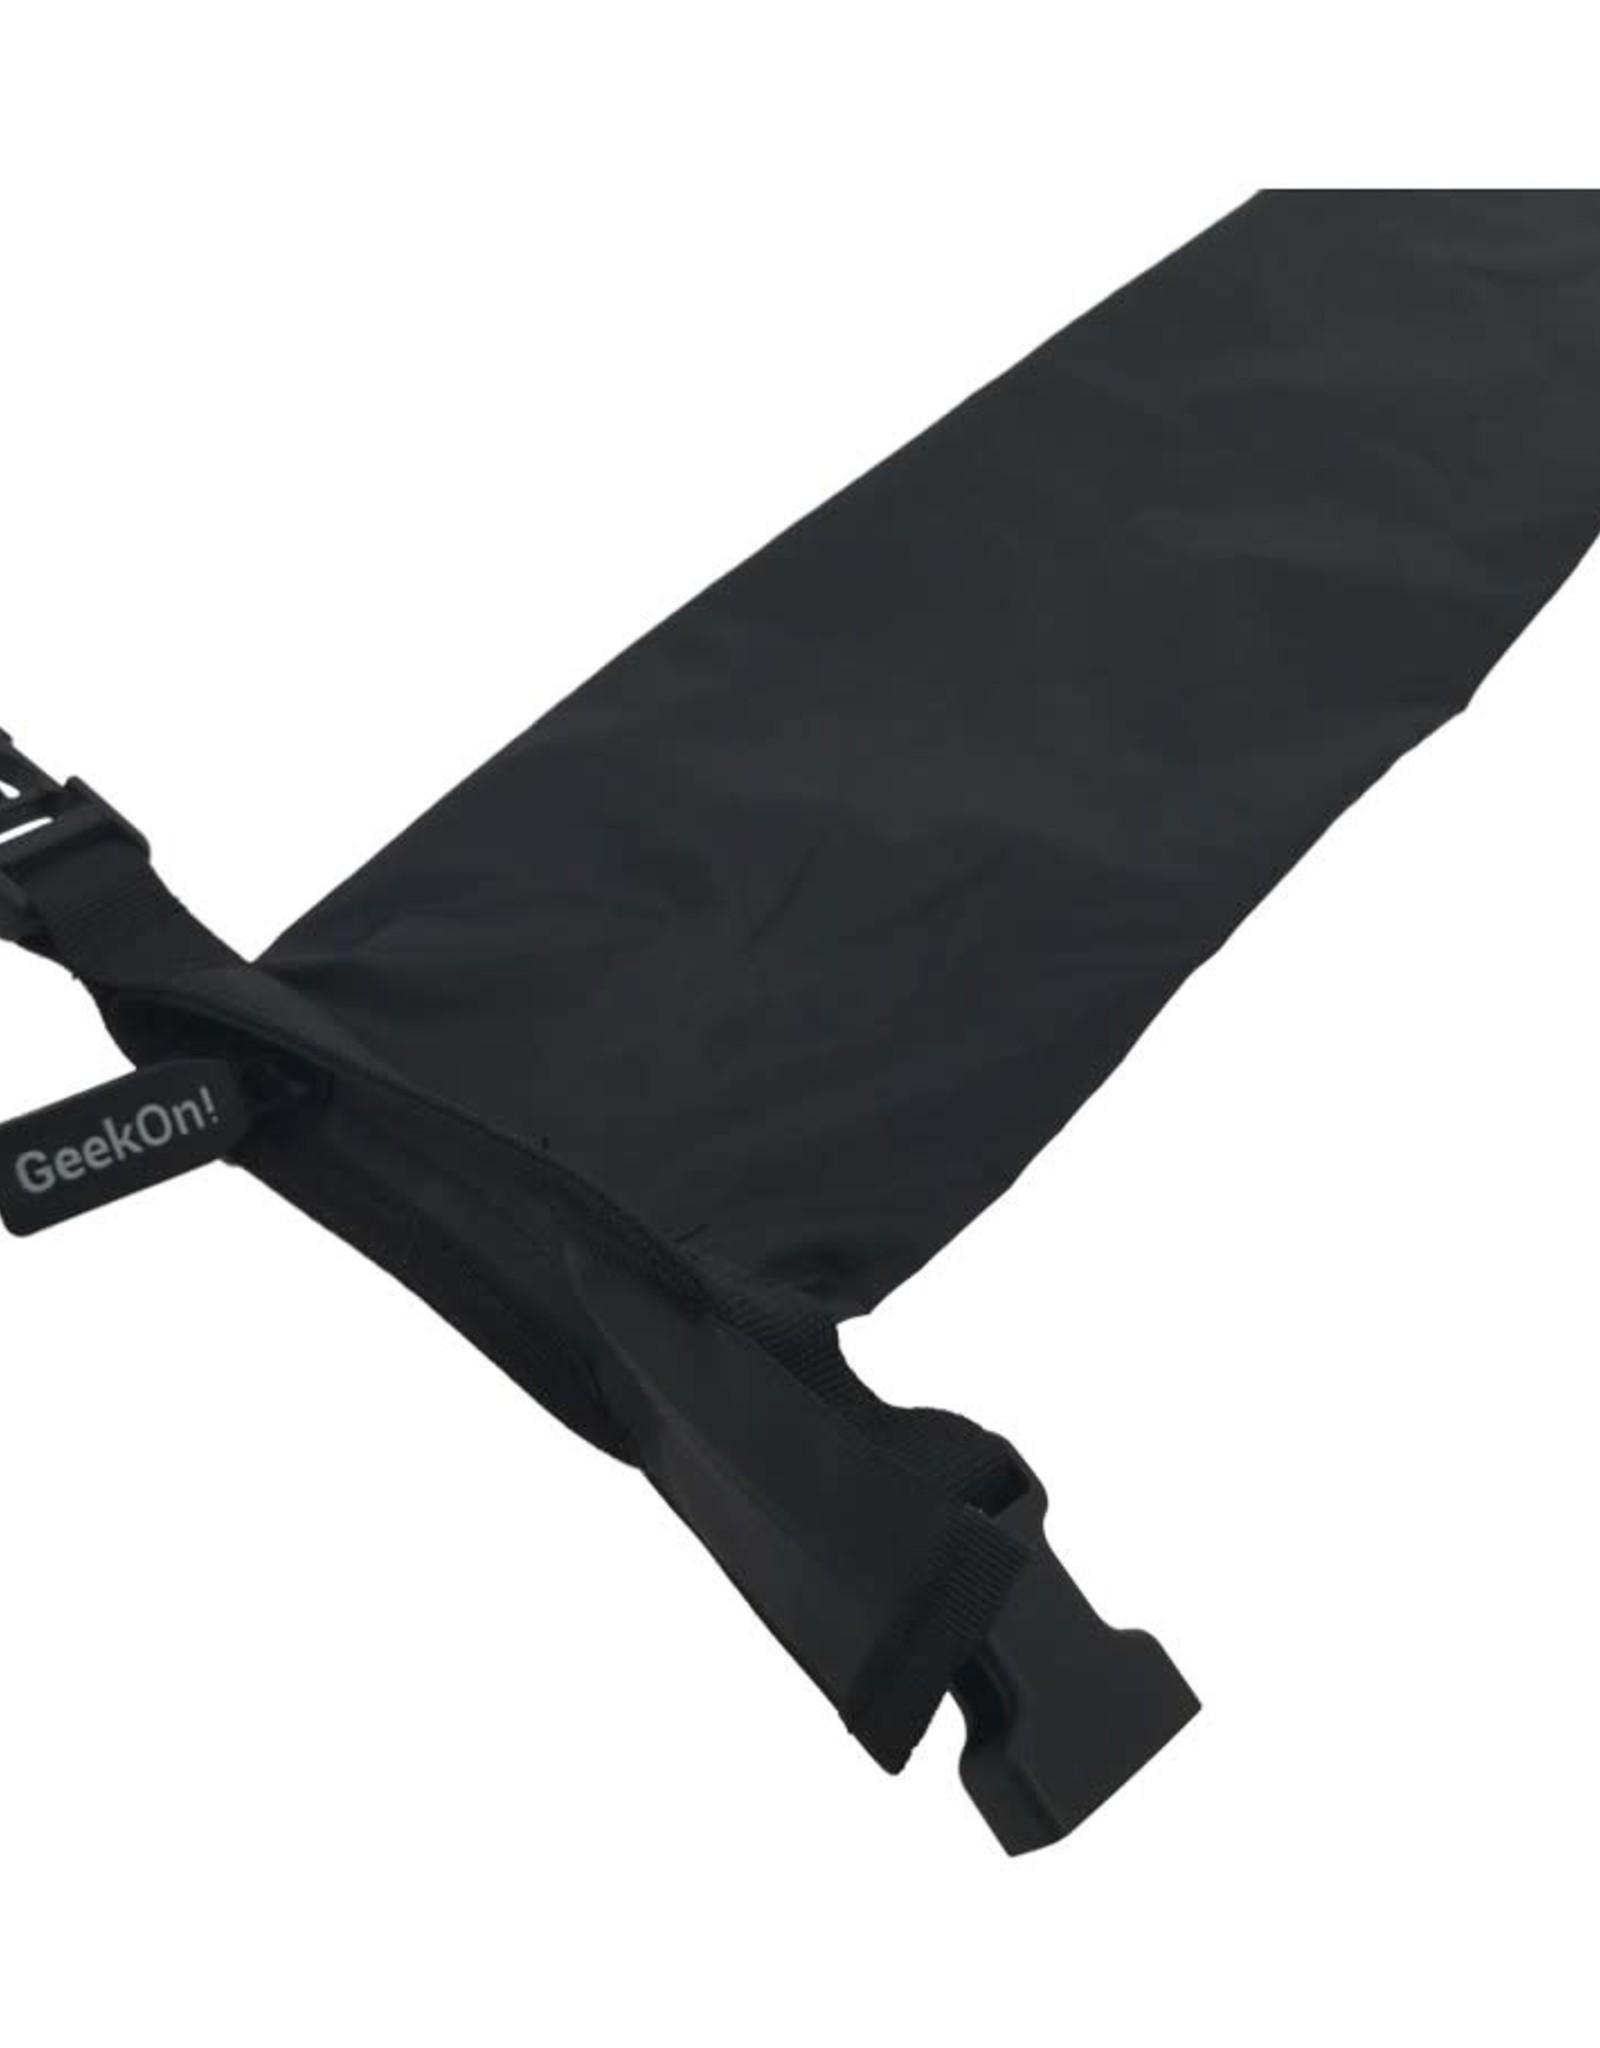 "Geek On Playmat Bag: Drybag of Doom 36"""